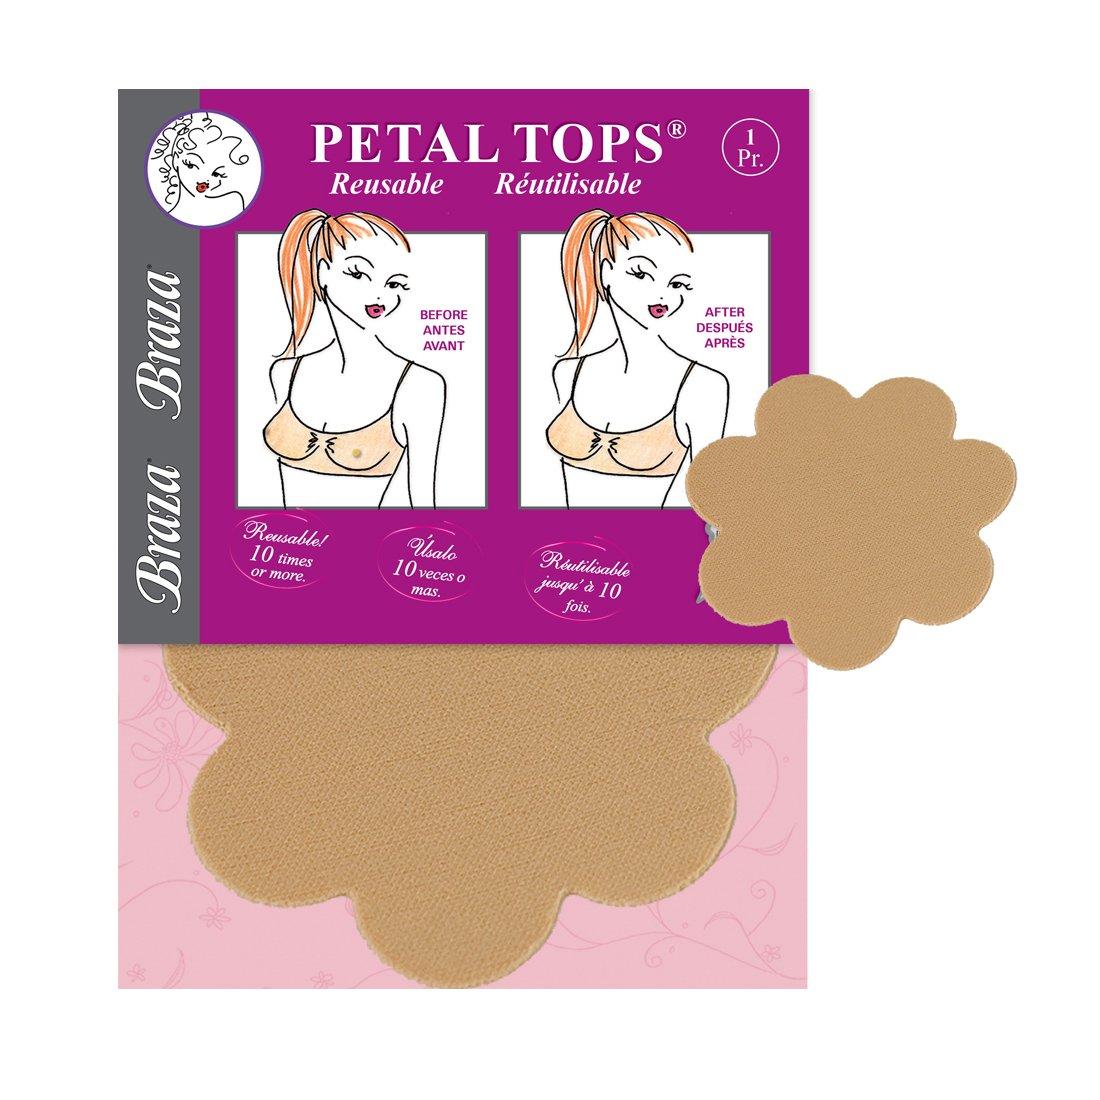 Braza Reusable Breast Petal Top Nipple Covers - 3 pair